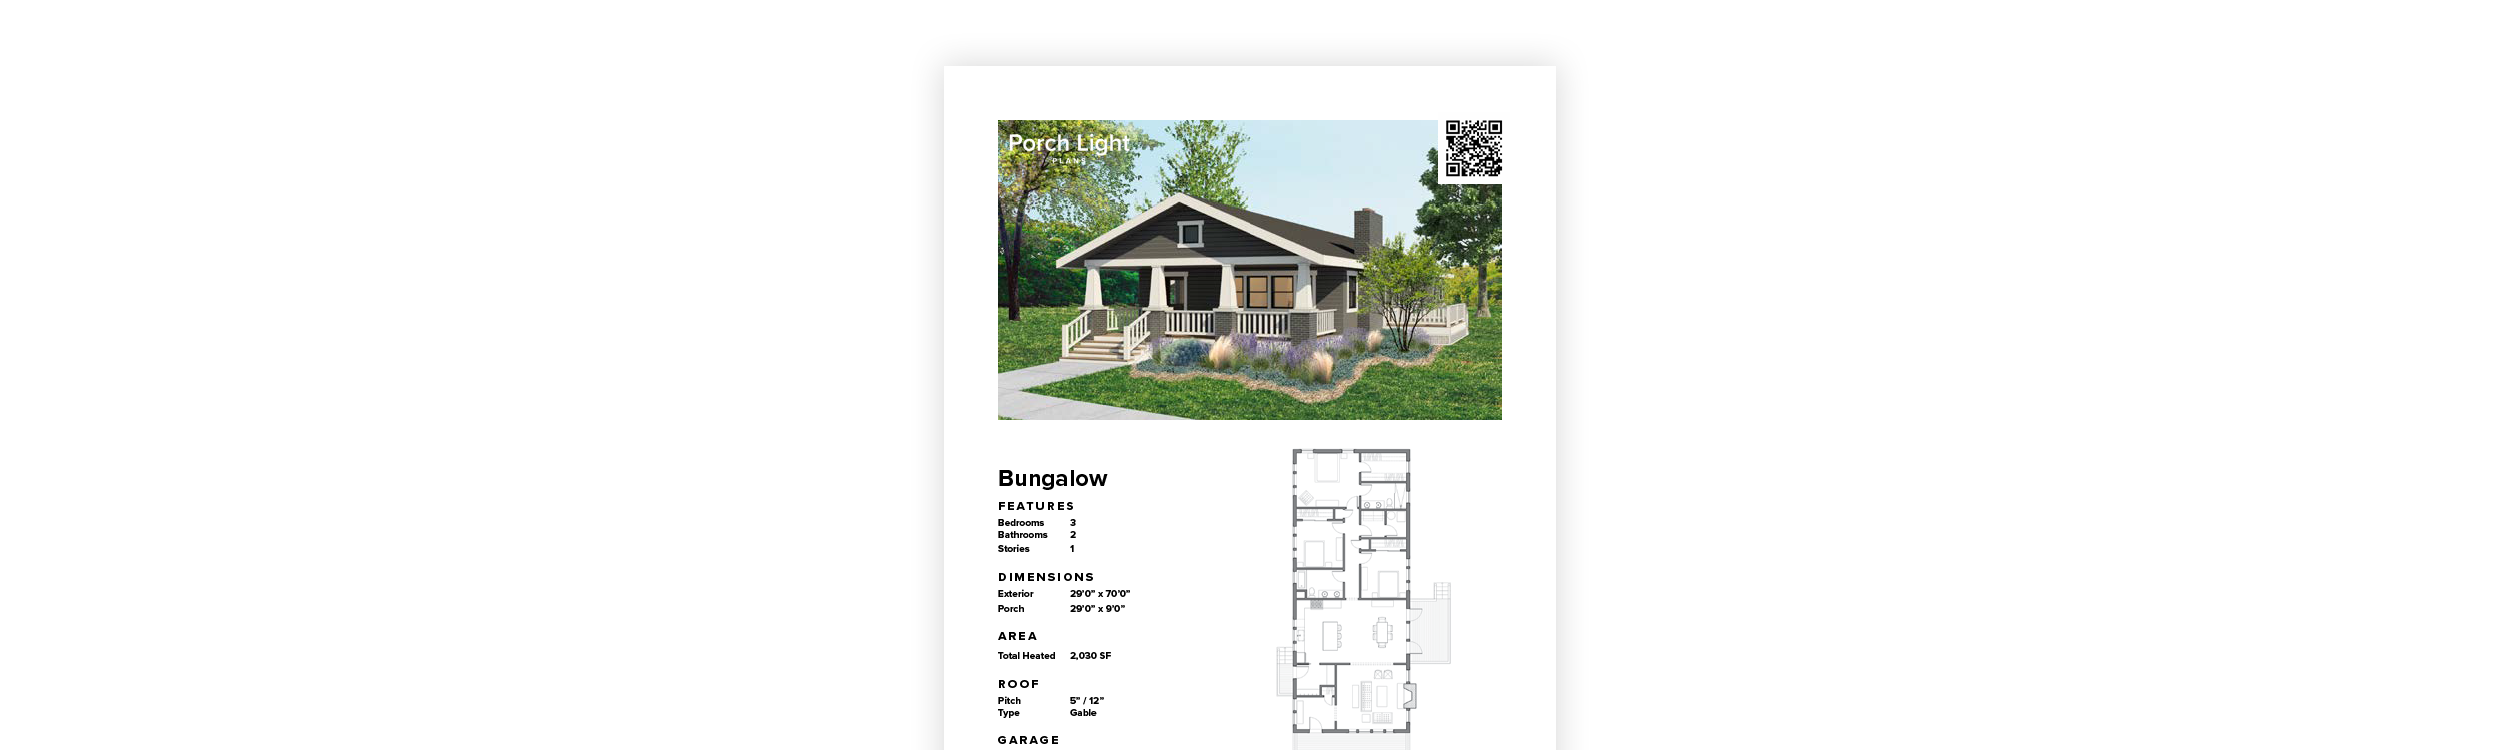 bungalow-tear-sheet.png